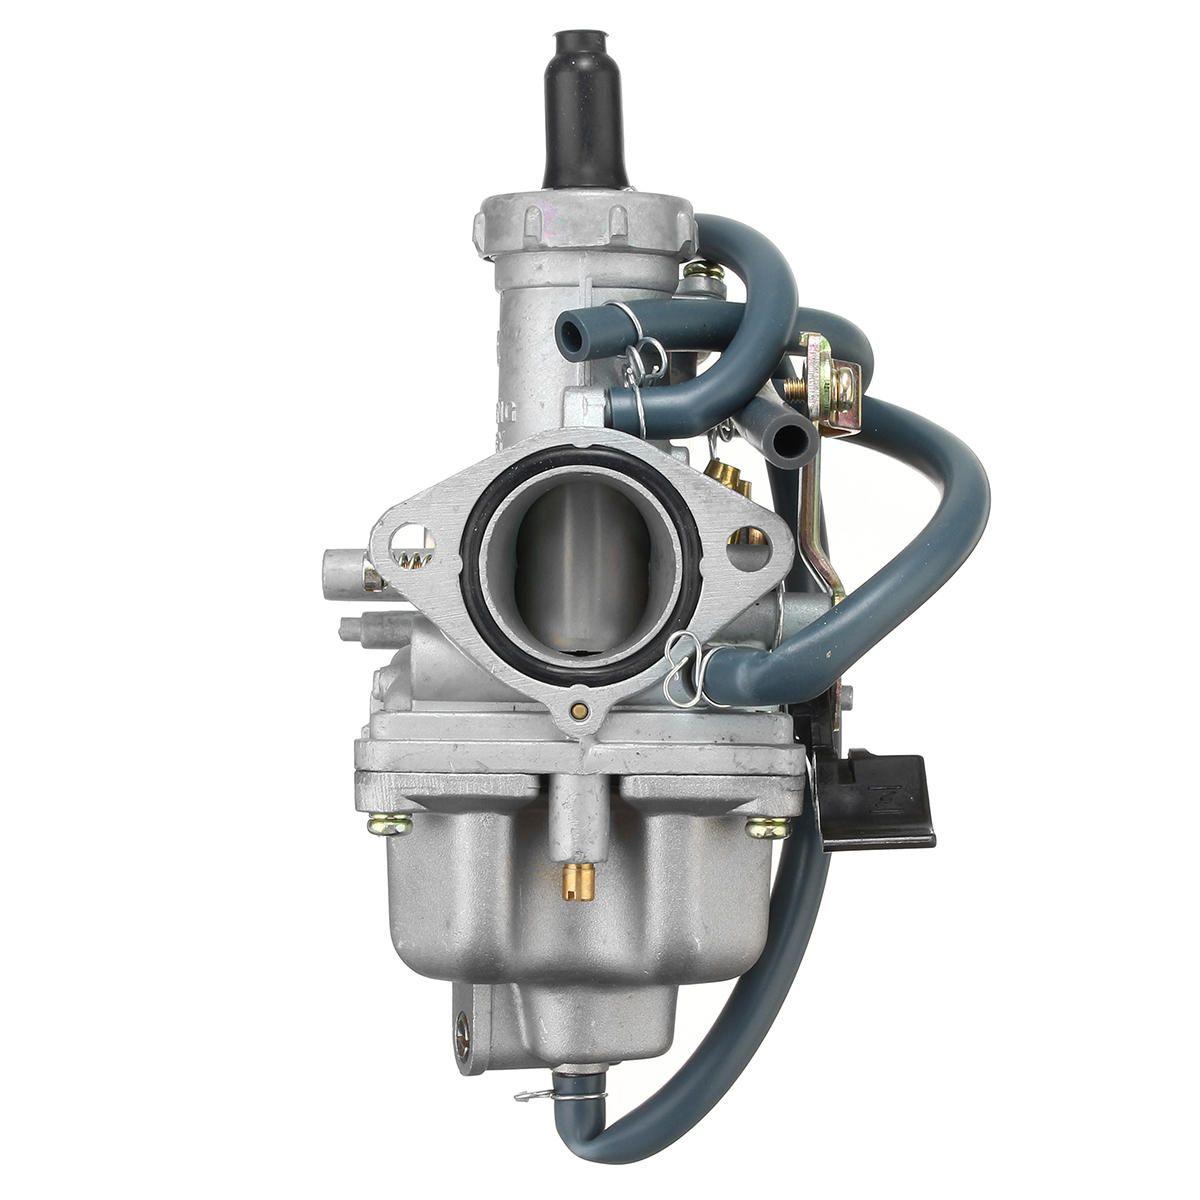 US$25.58 Carburetor & Throttle Cable For Honda ATV Recon ...